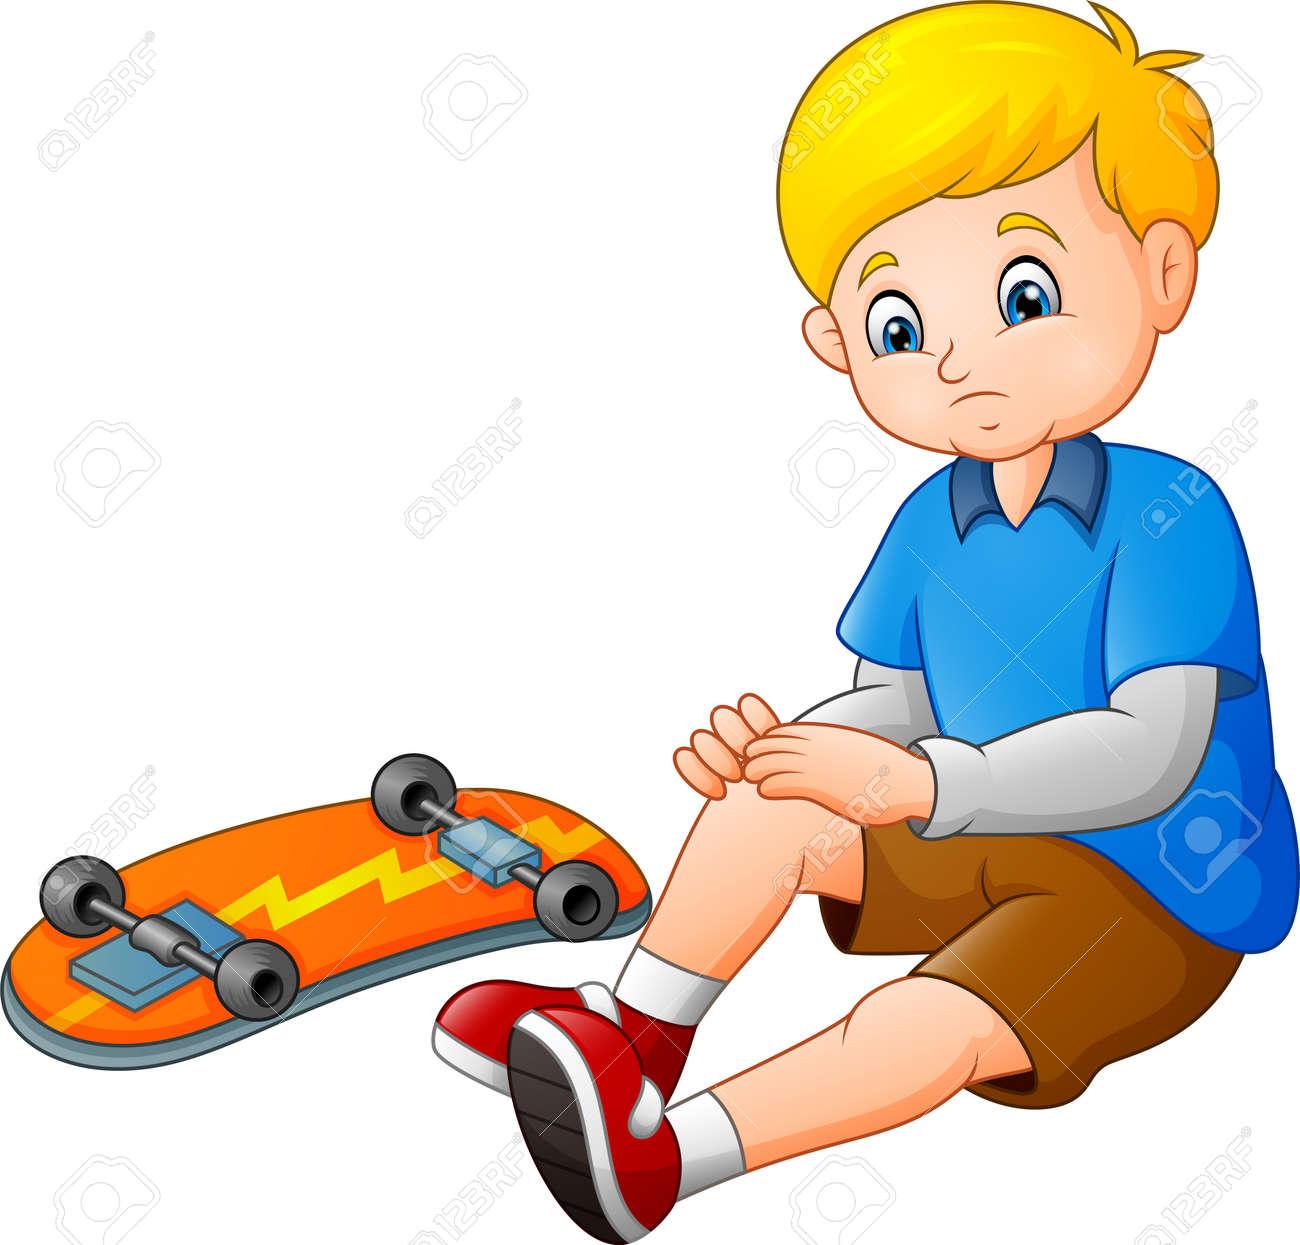 Cartoon sad skater falling of his skateboard - 113507656